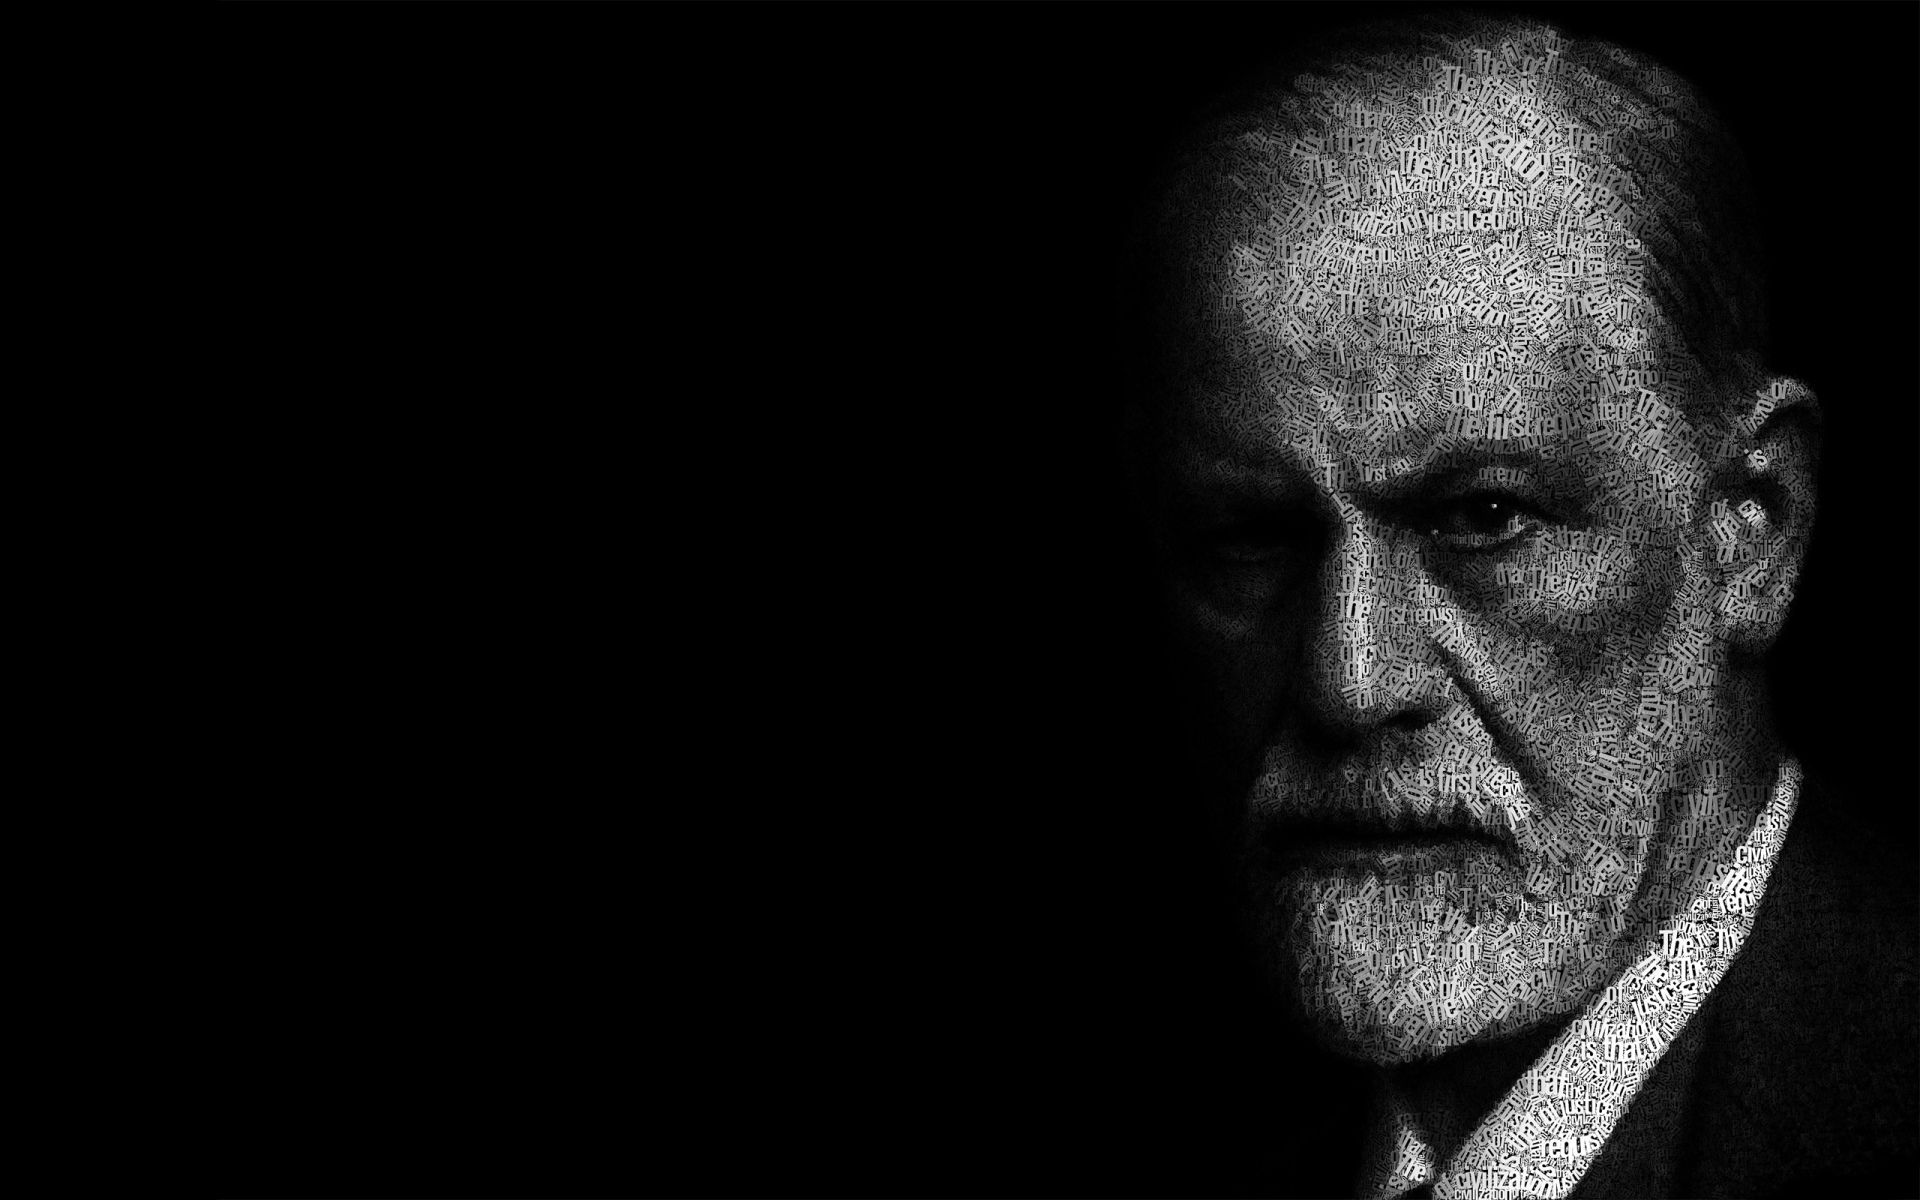 Artistic Typography Sigmund Freud Black White Face Black 1920x1200